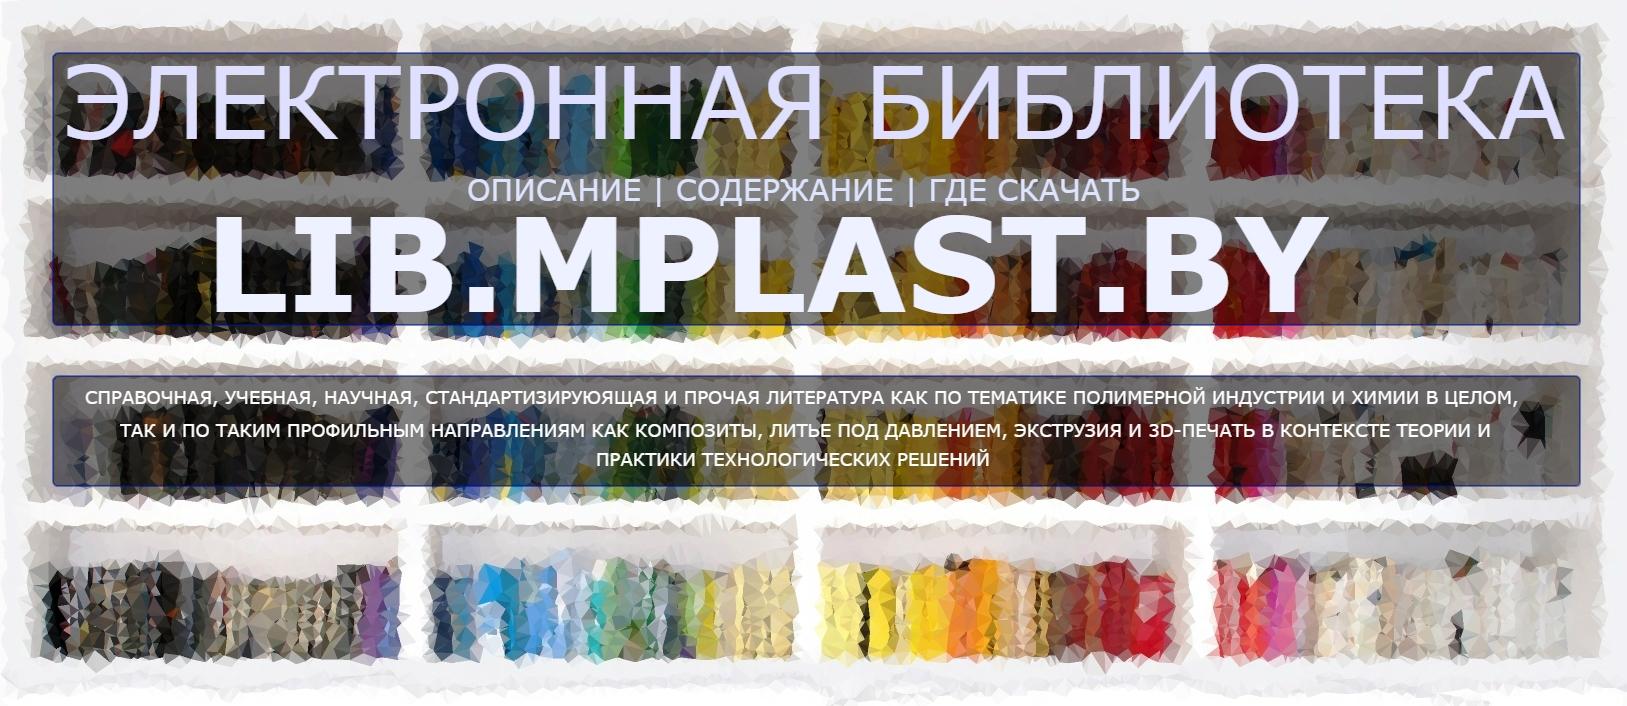 Электронная библиотека lib.MPlast.by